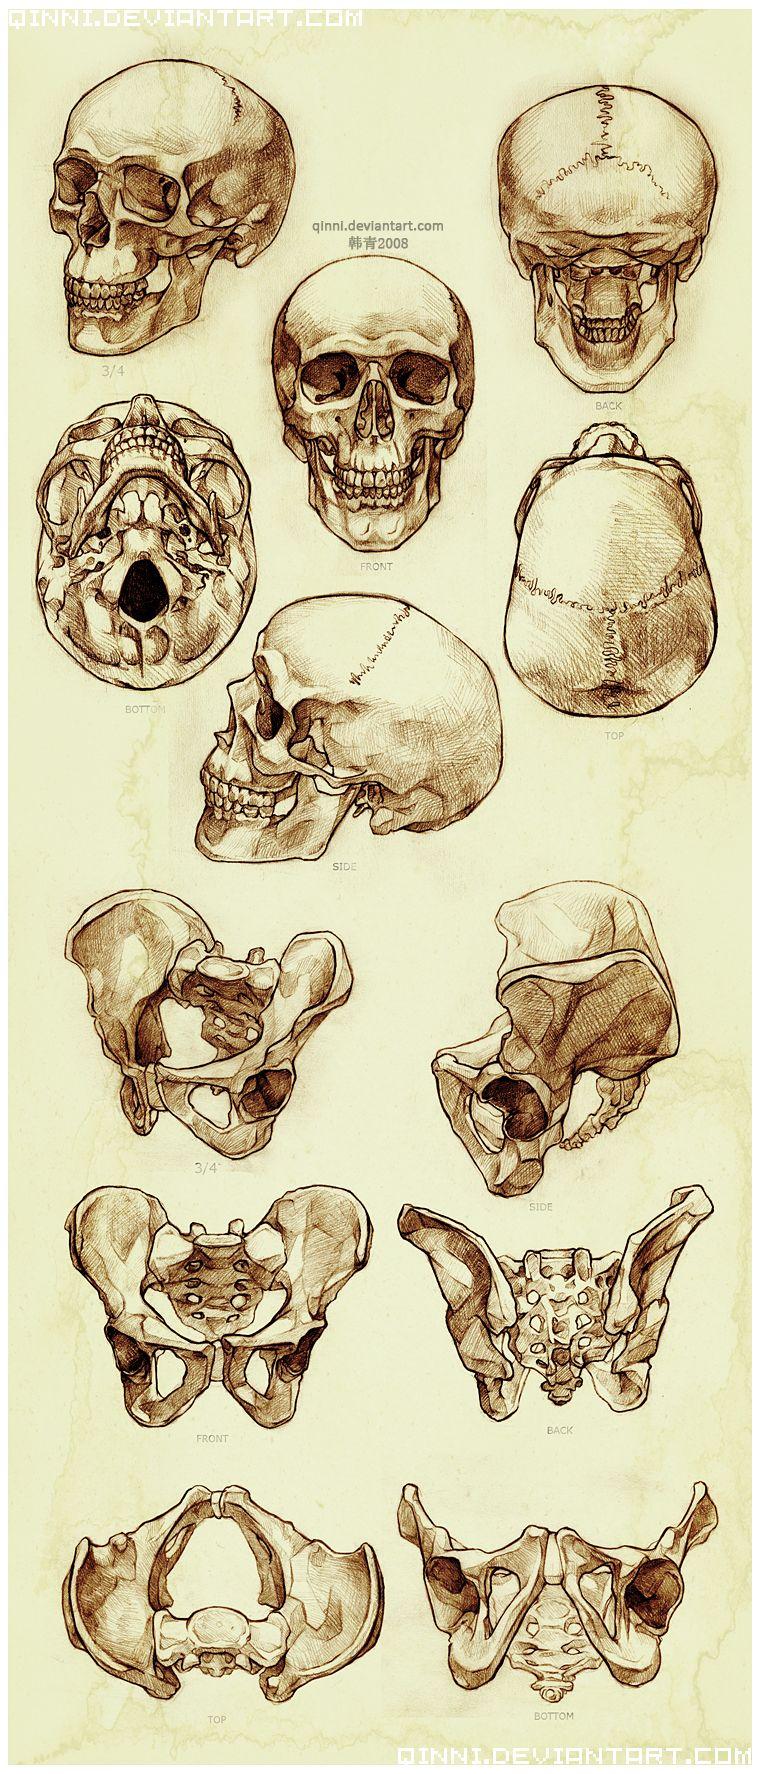 Skull and Pelvis Study by Qinni on deviantART via PinCG.com ...